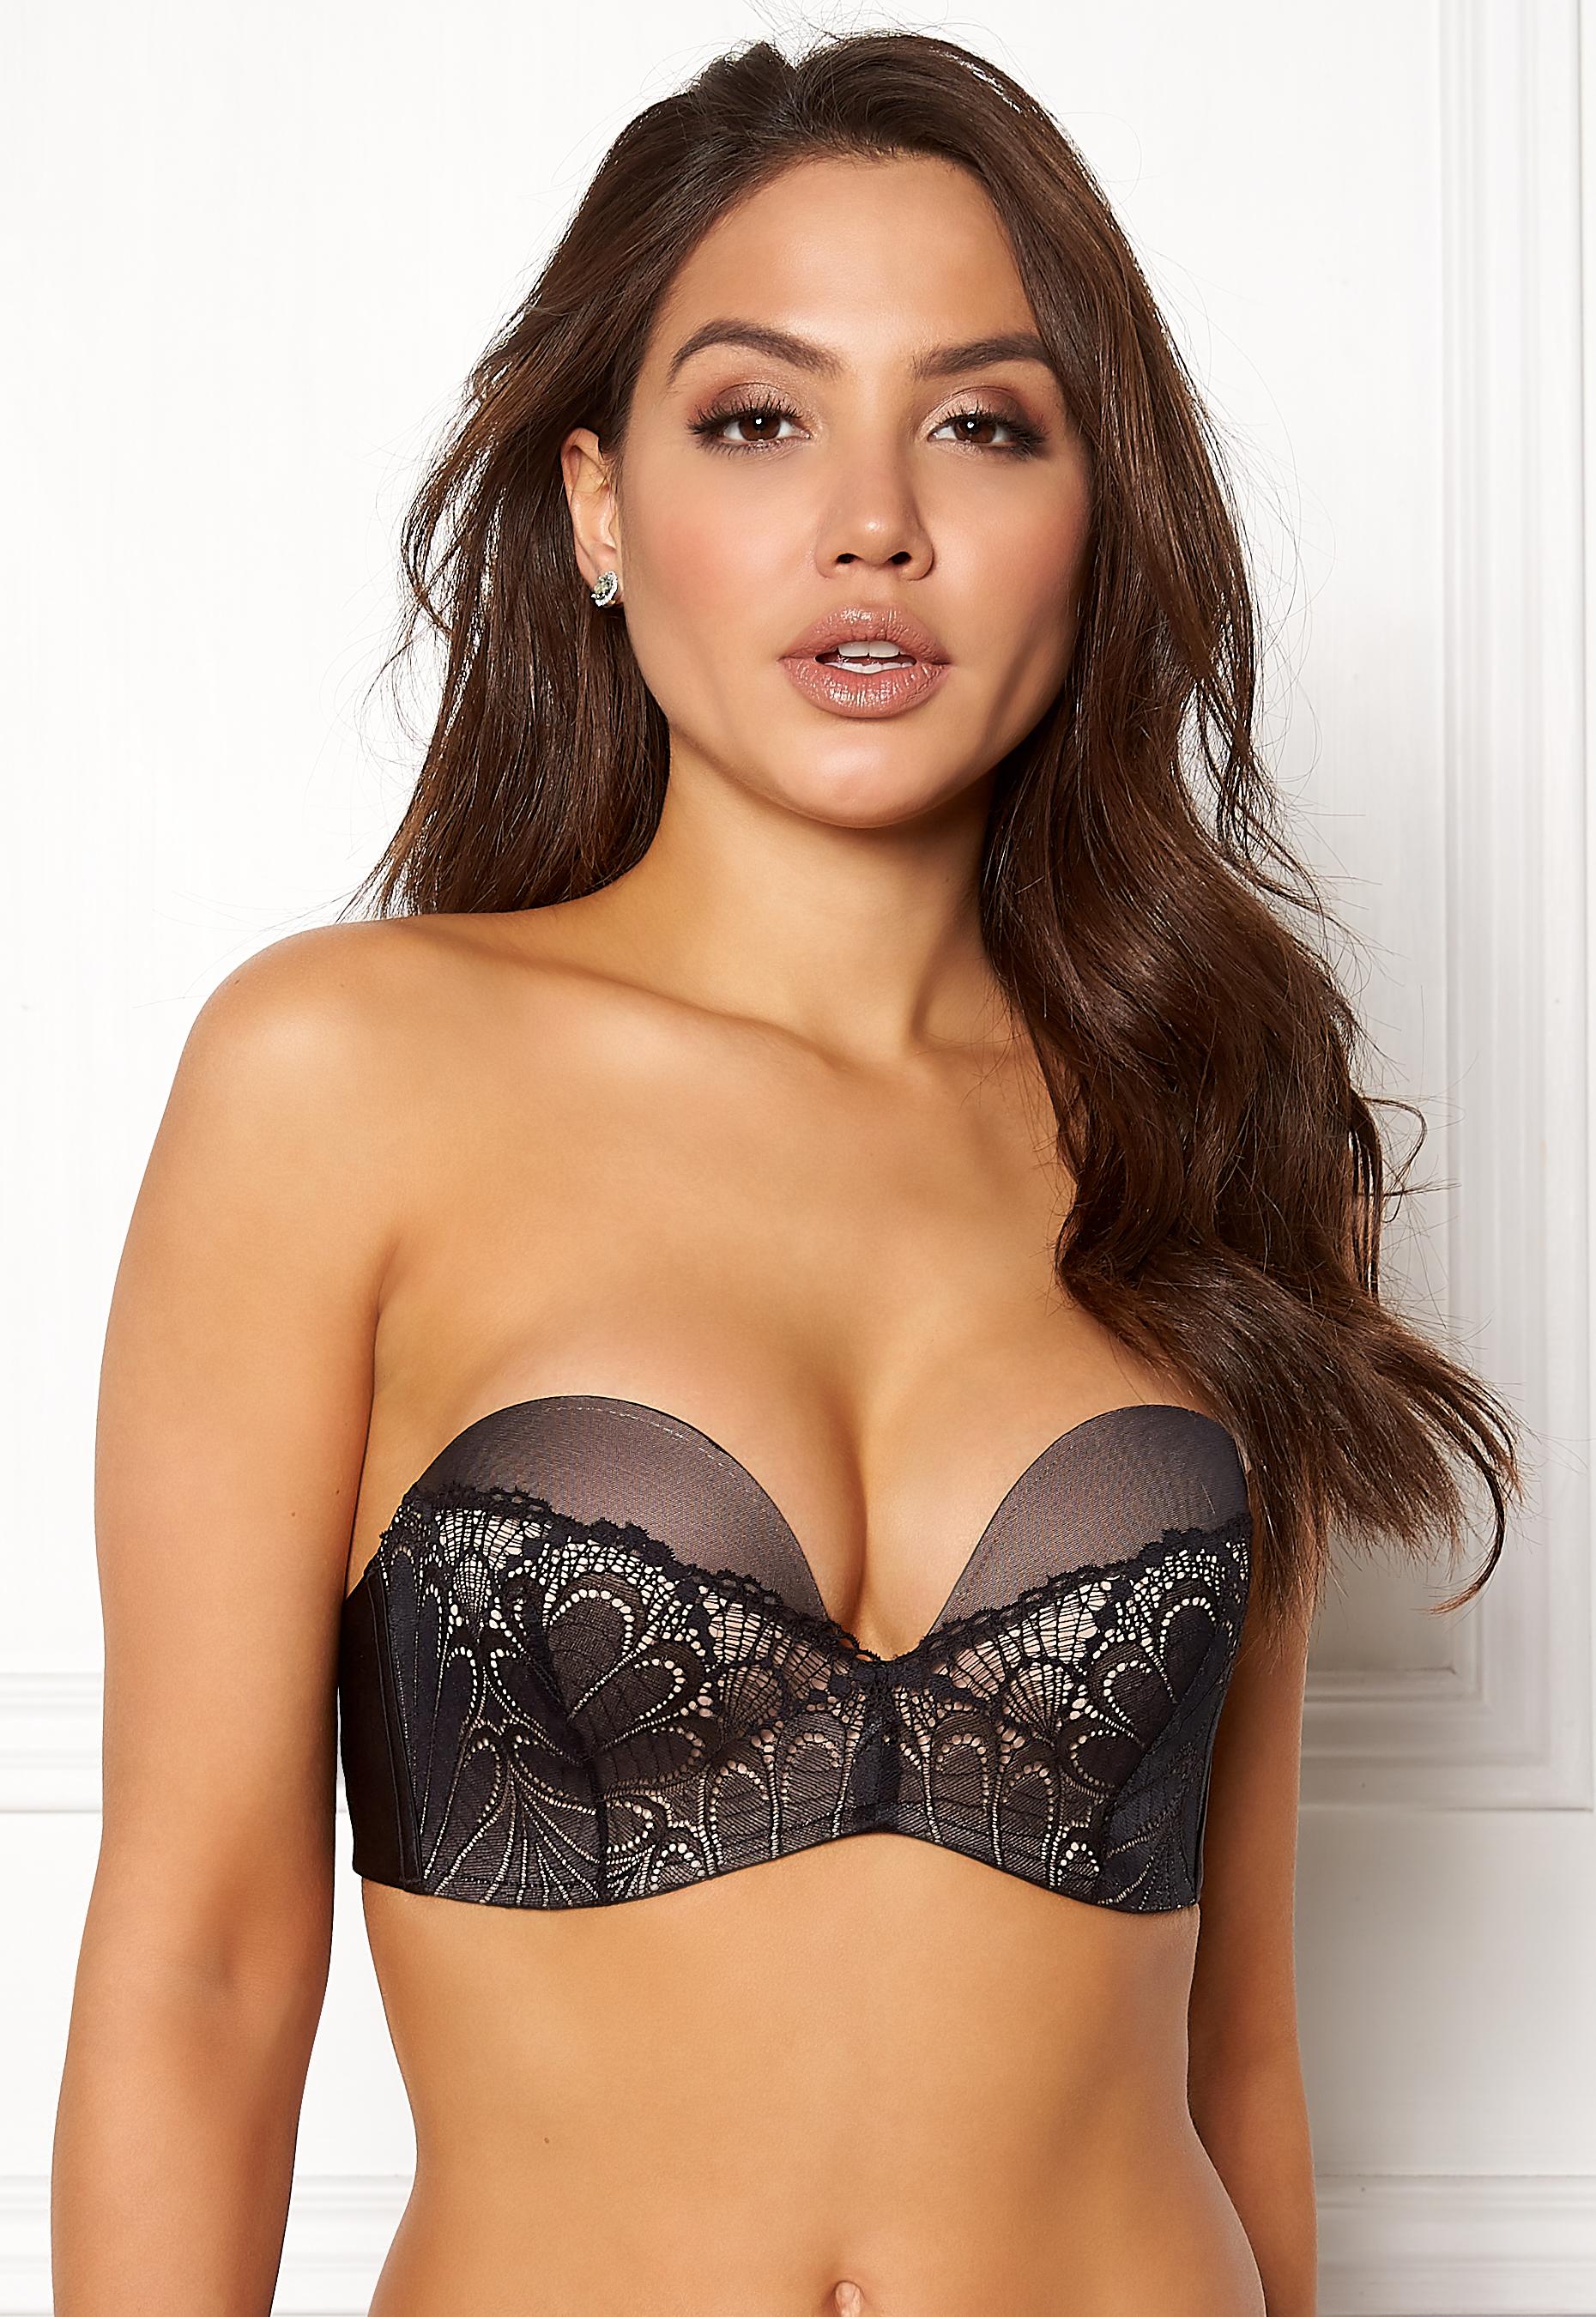 308b90dc4e553 Wonderbra Glamour Perfect Strapless Bra Black - Bubbleroom